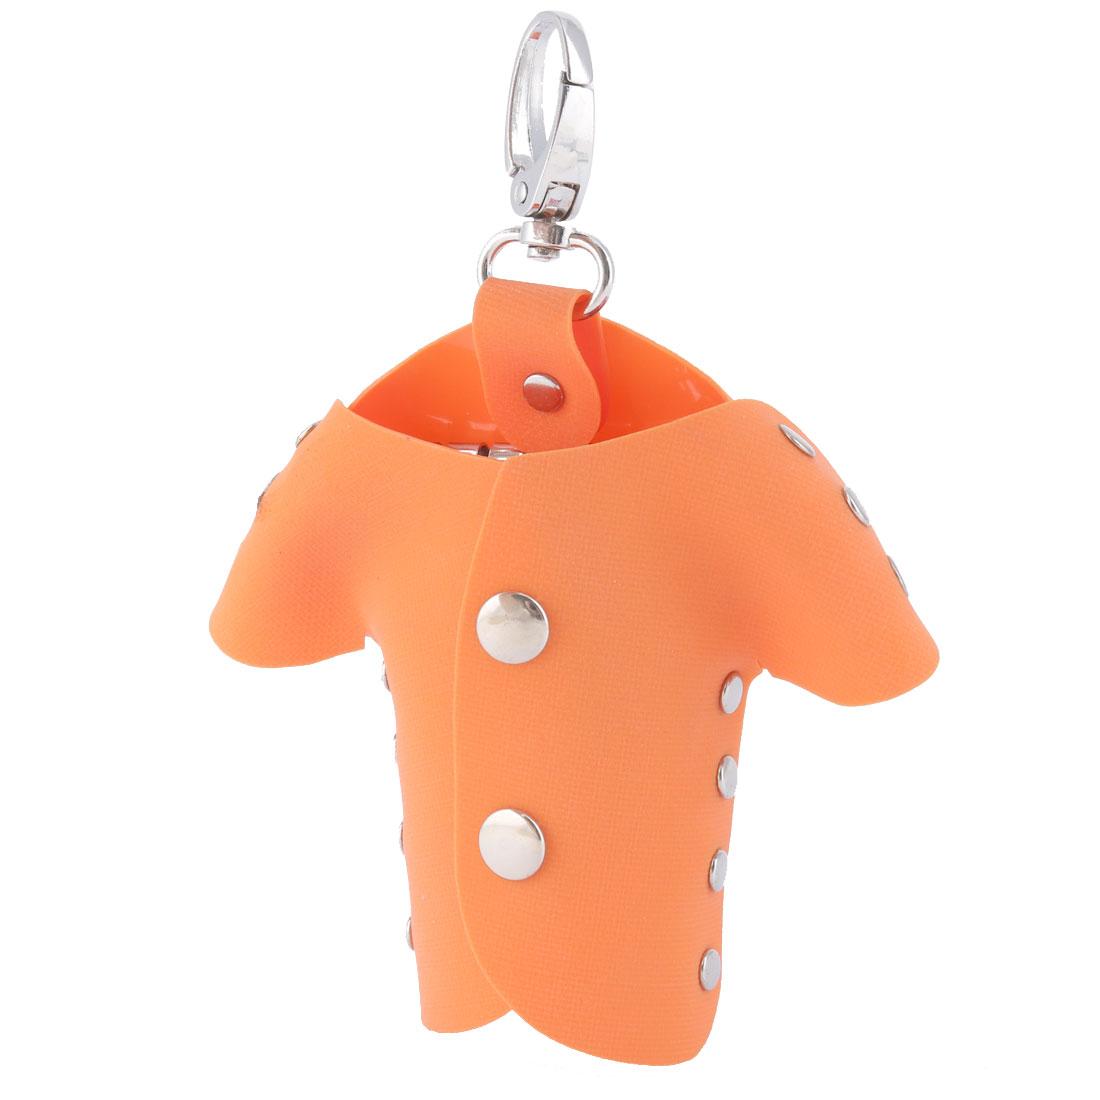 Plastic Cover Portable Keychain Keys Holder Bag Case Silver Tone Orange